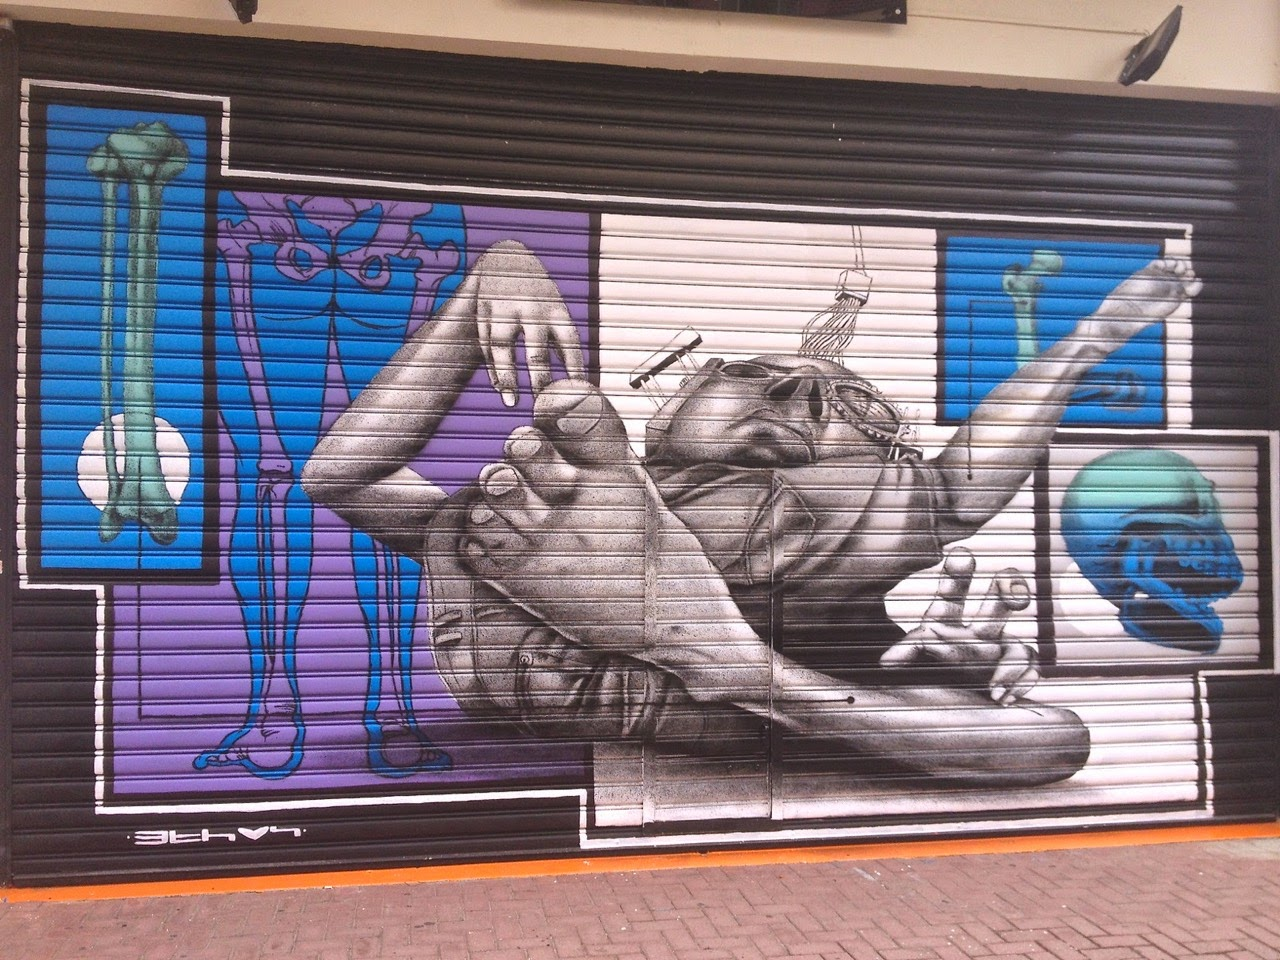 claudio-ethos-new-murals-in-sao-paulo-brazil-03